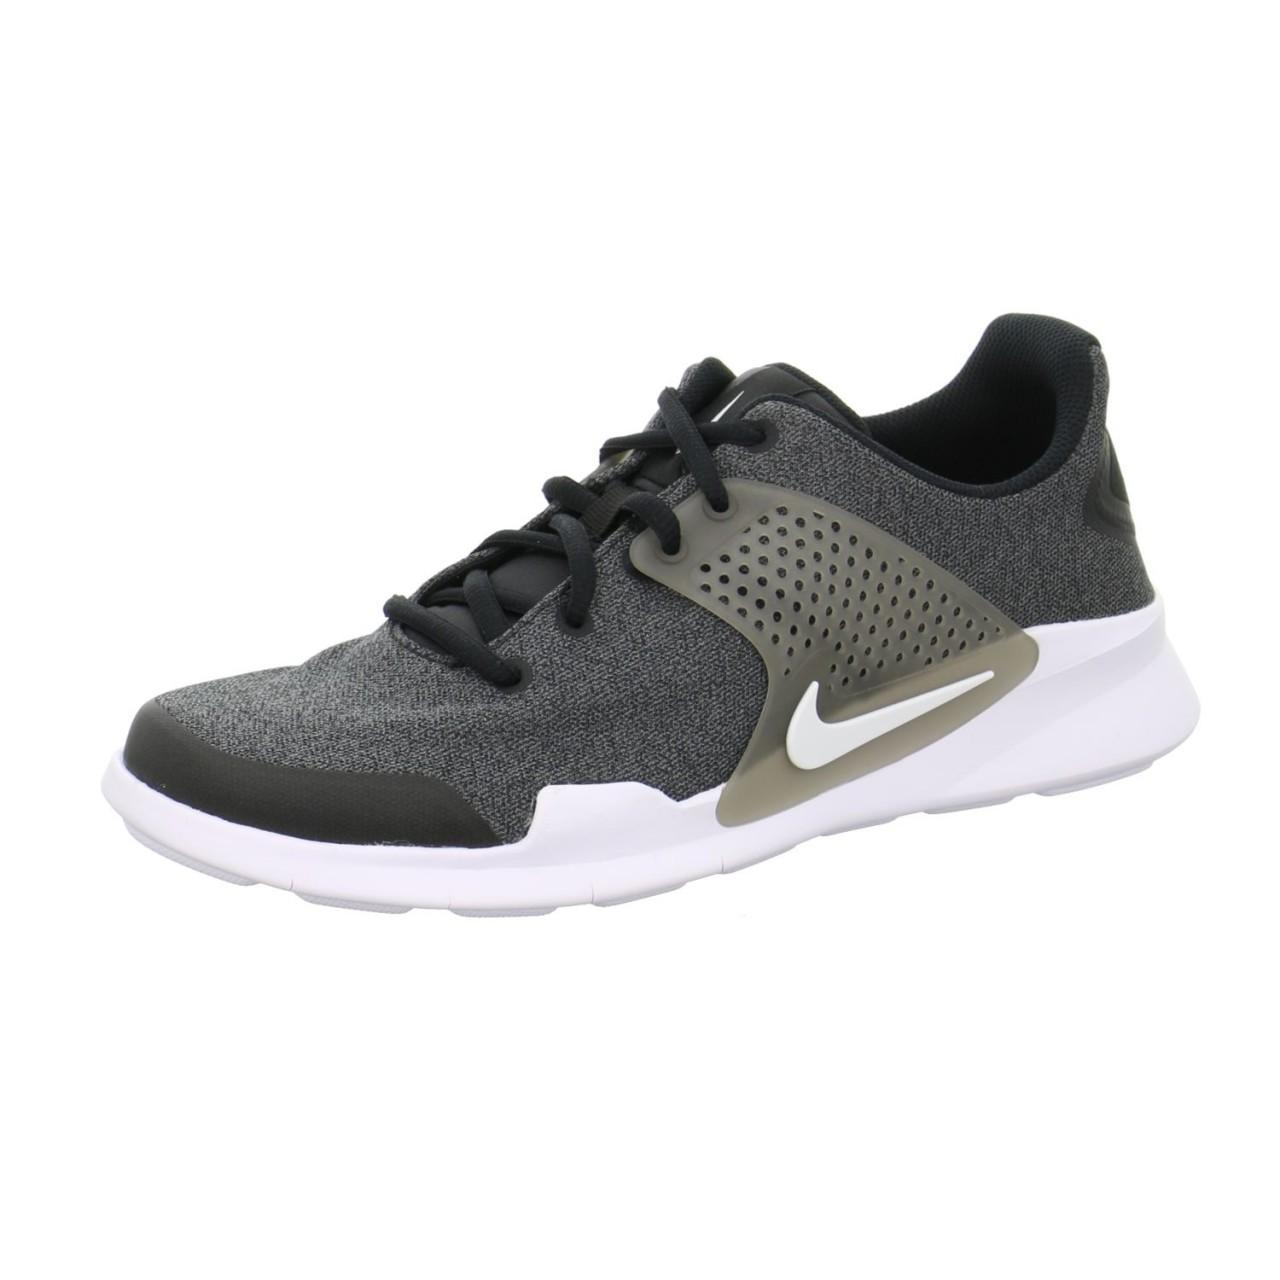 fec40982549b Nike Trainers Black Arrowz in Gray for Men - Save 8% - Lyst